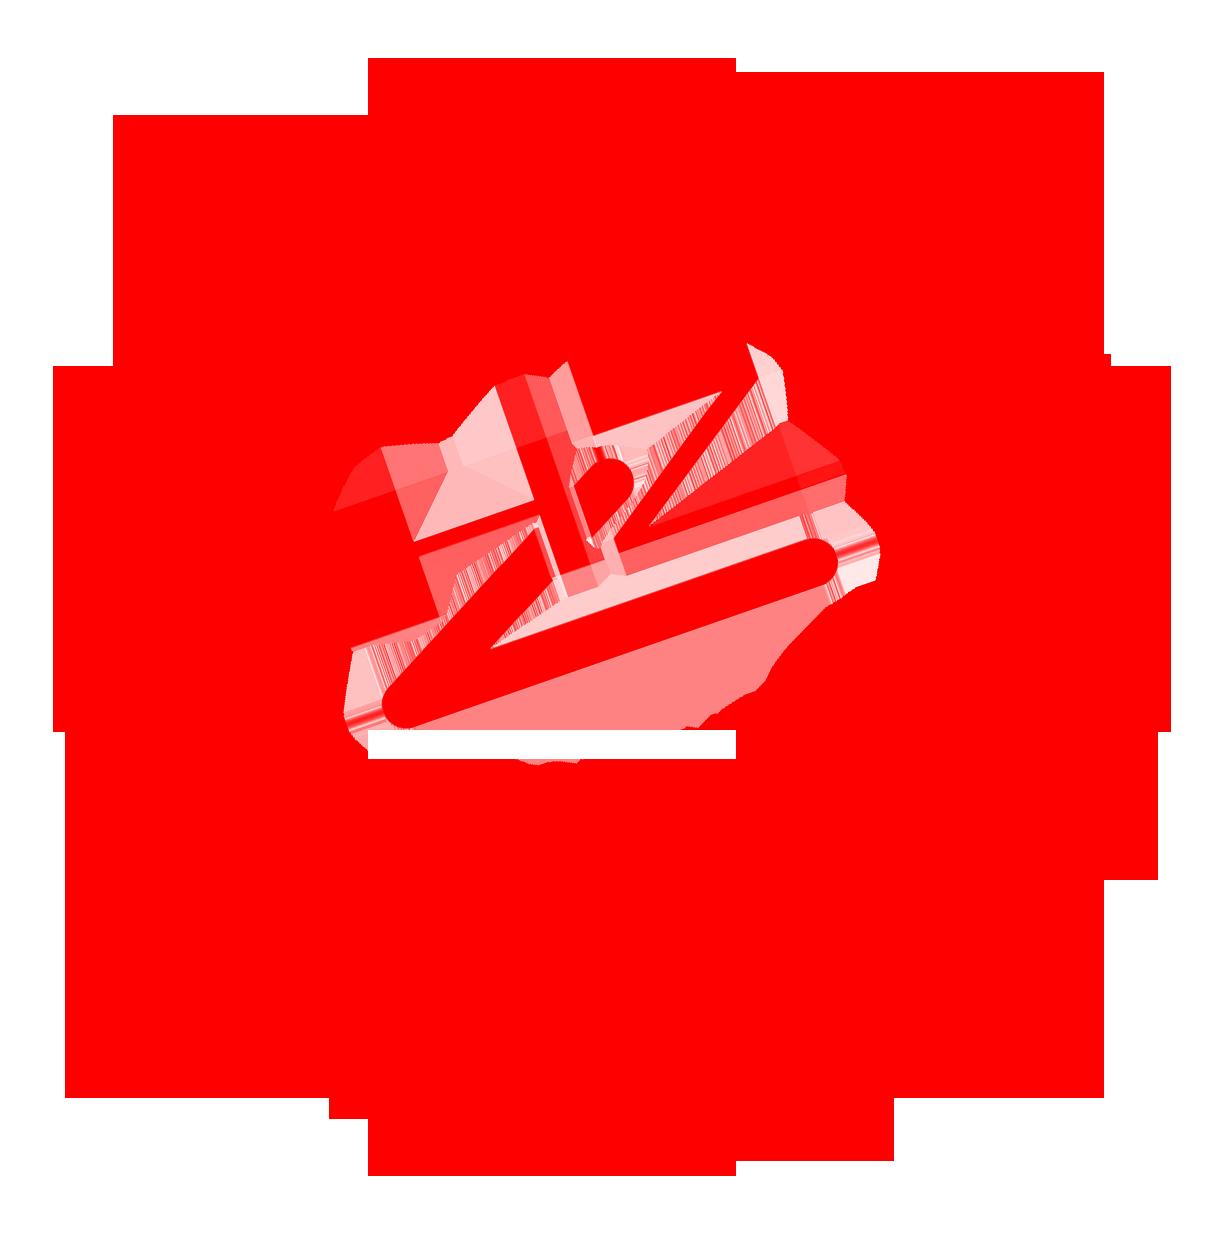 HZ_Stamp_Performance_Mod1